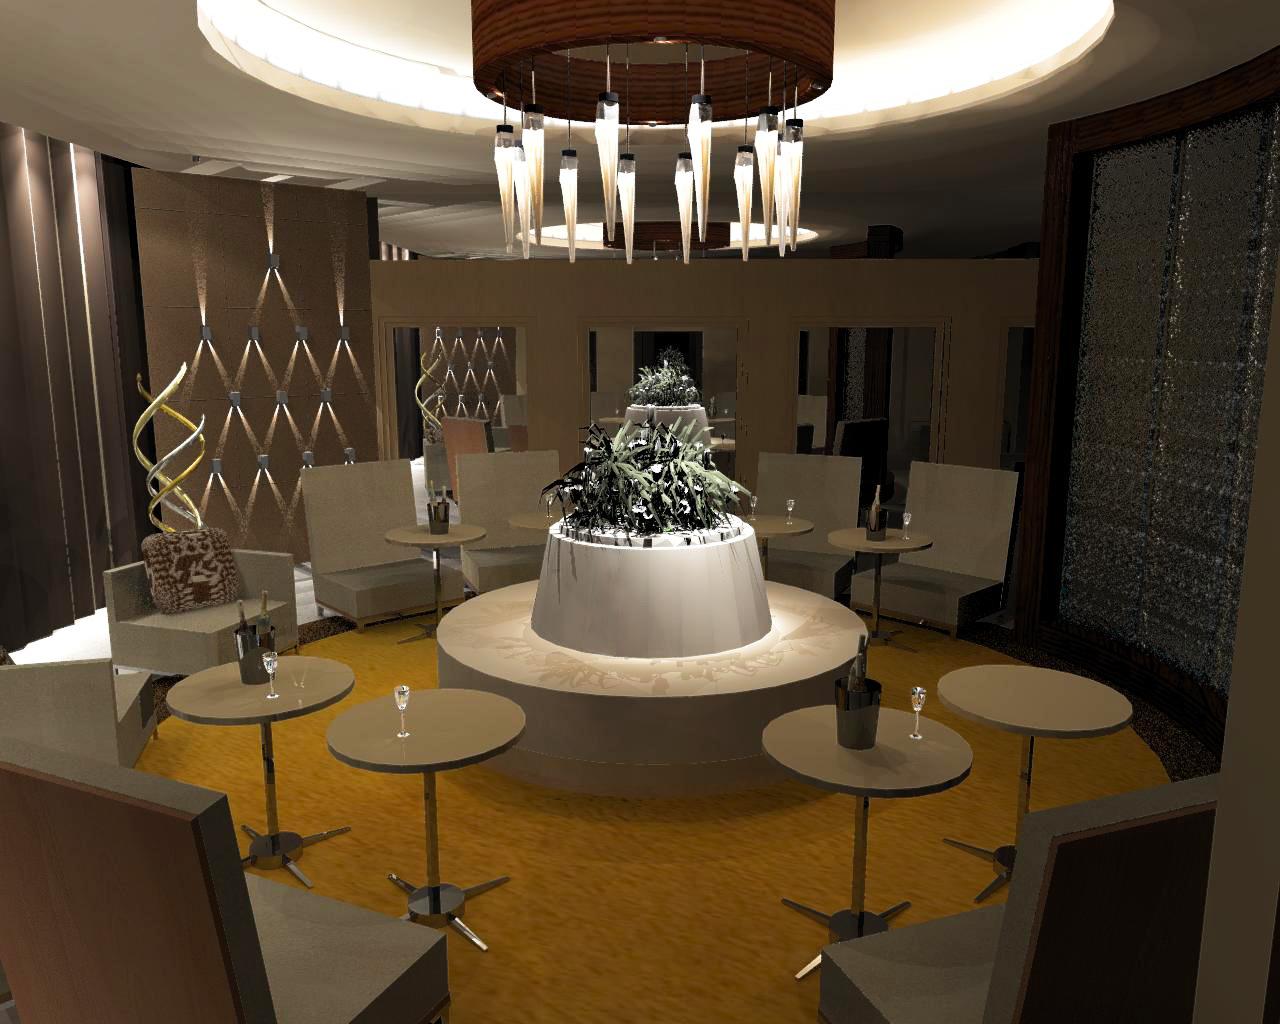 Interior design concept nestorlazarte rosales for Vip room interior design